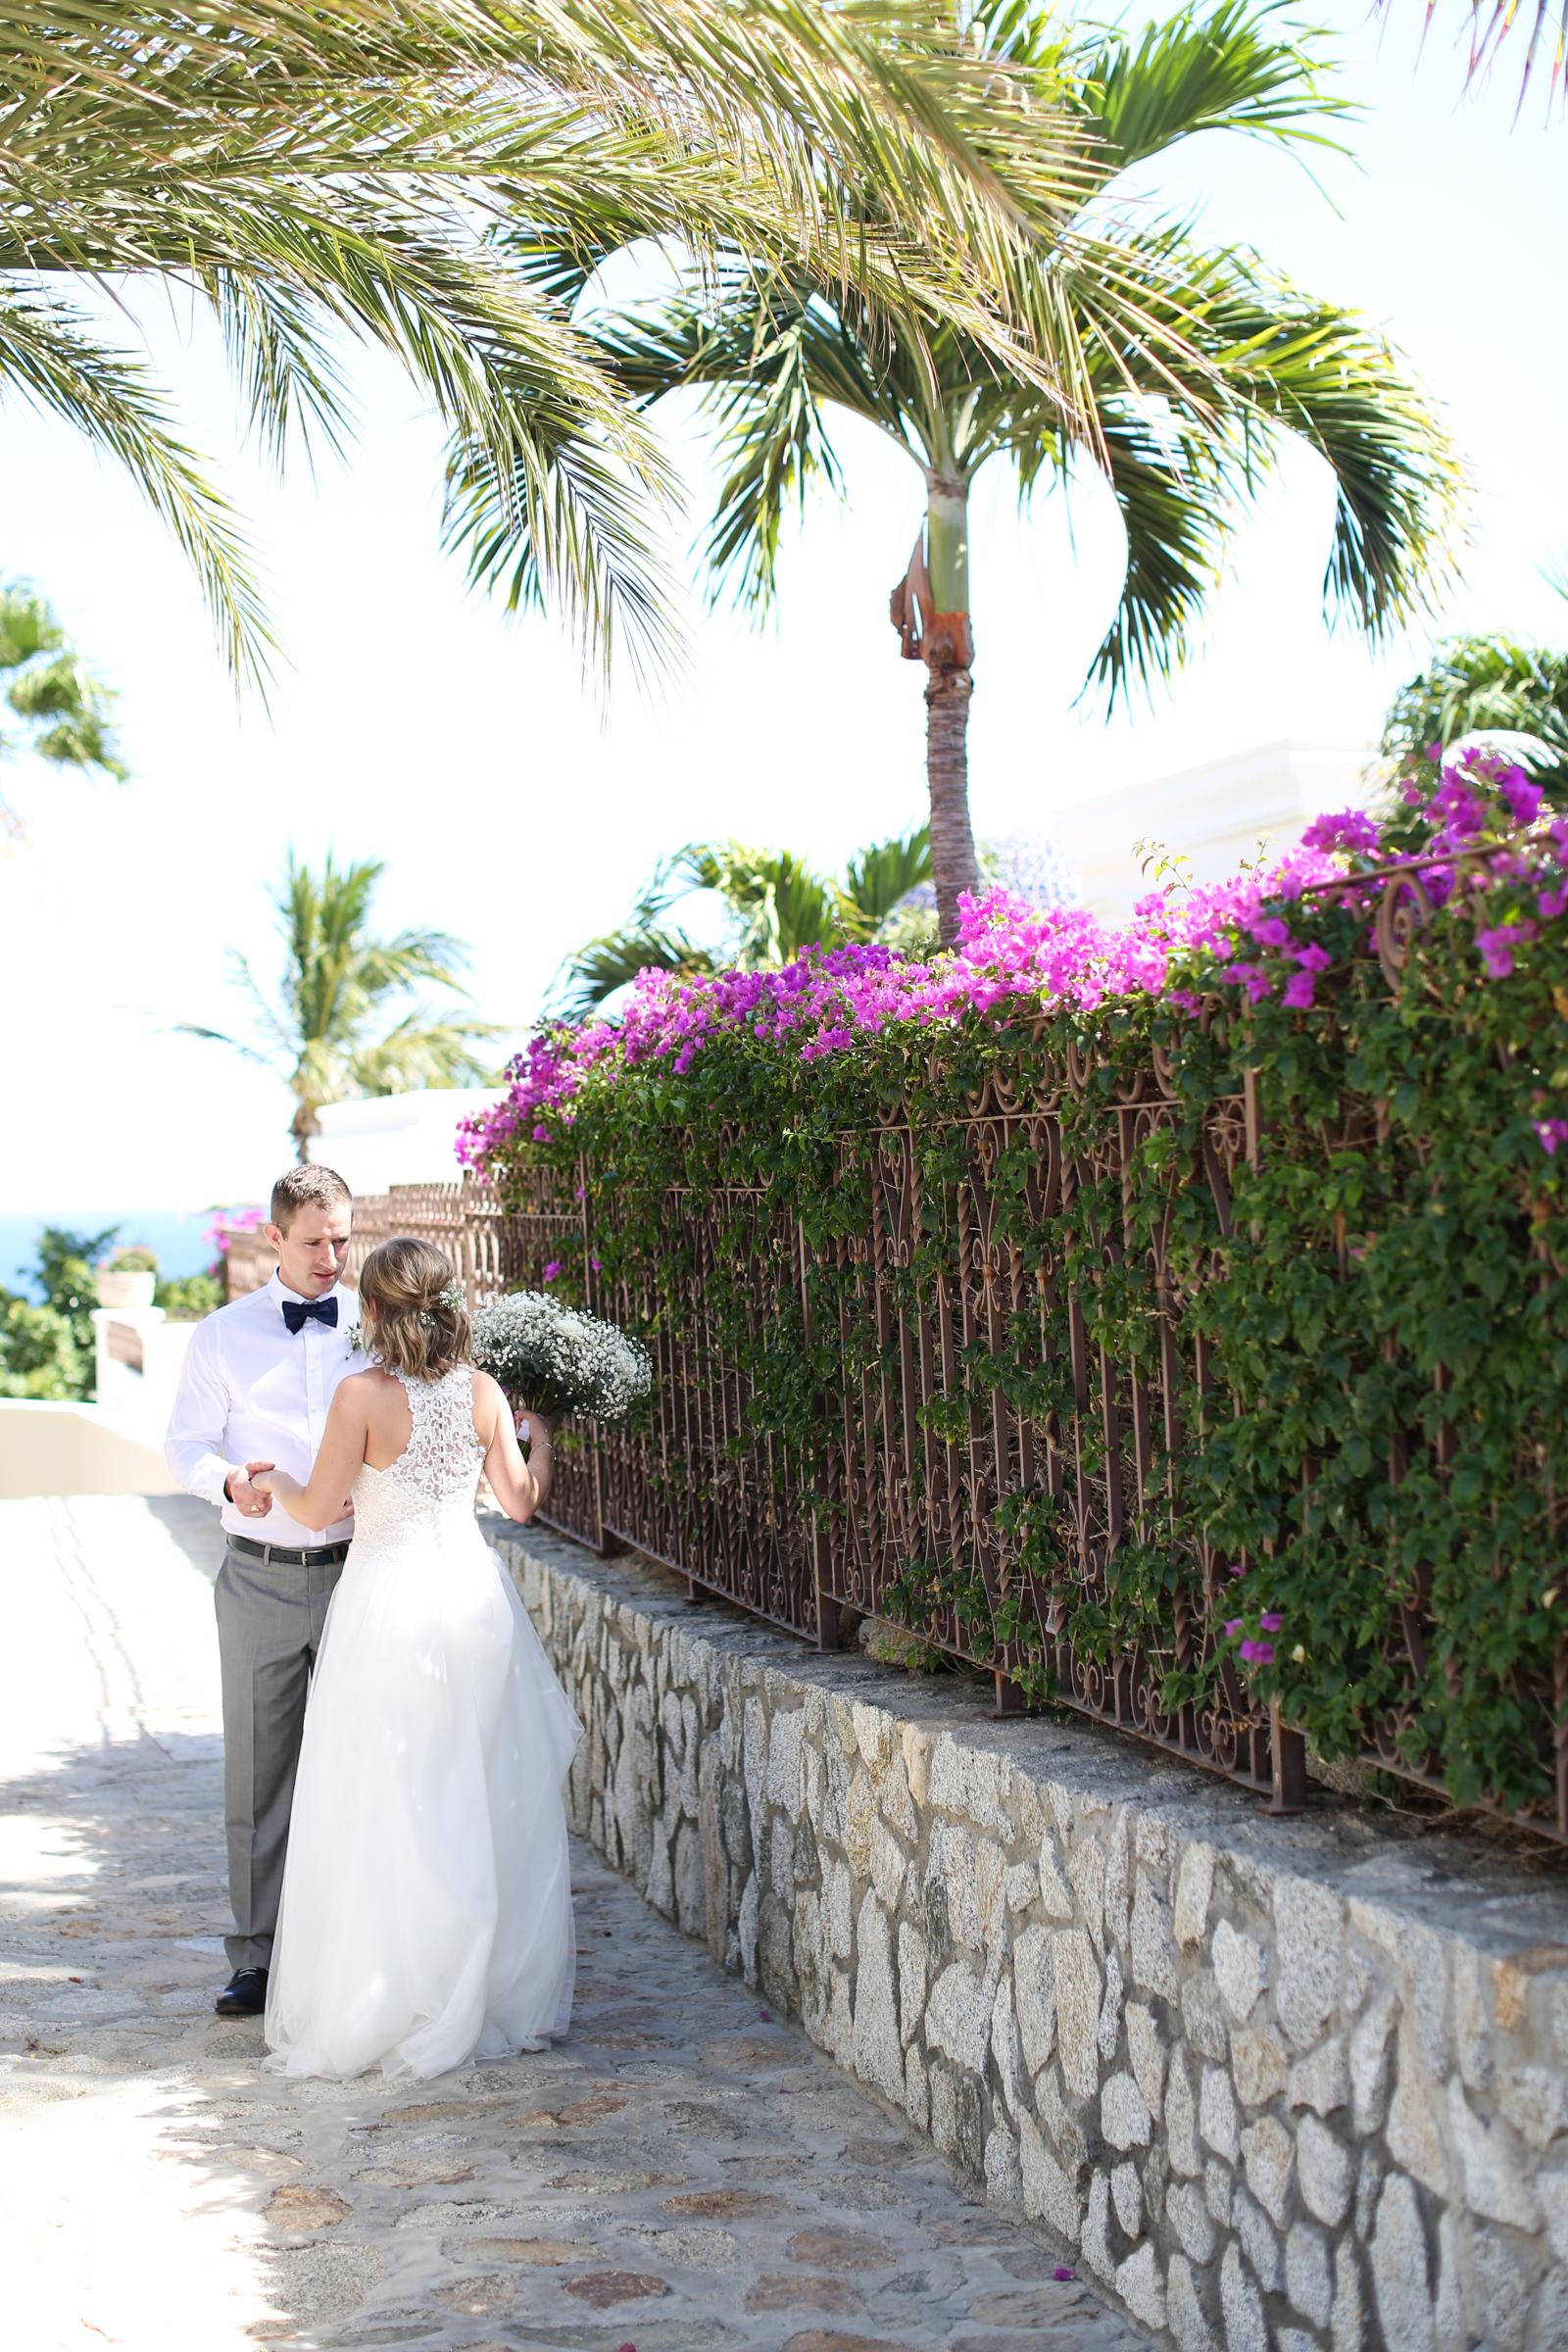 Katie+Chris-Mexico-Wedding-29.jpg